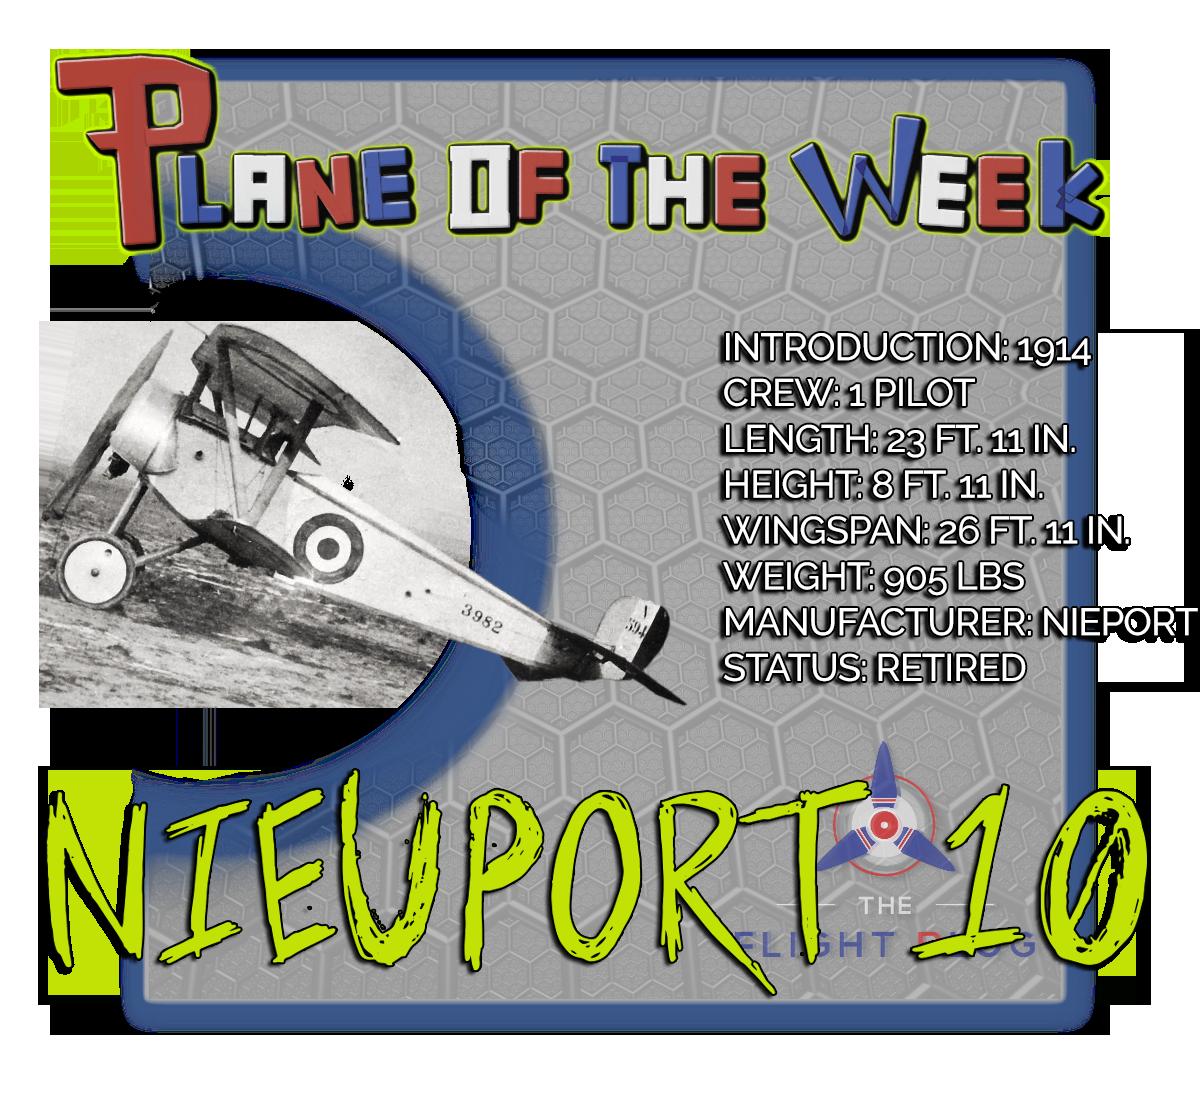 plane of the week, the flight blog, nieuport 10, wwI aircraft, reconnaissance plane